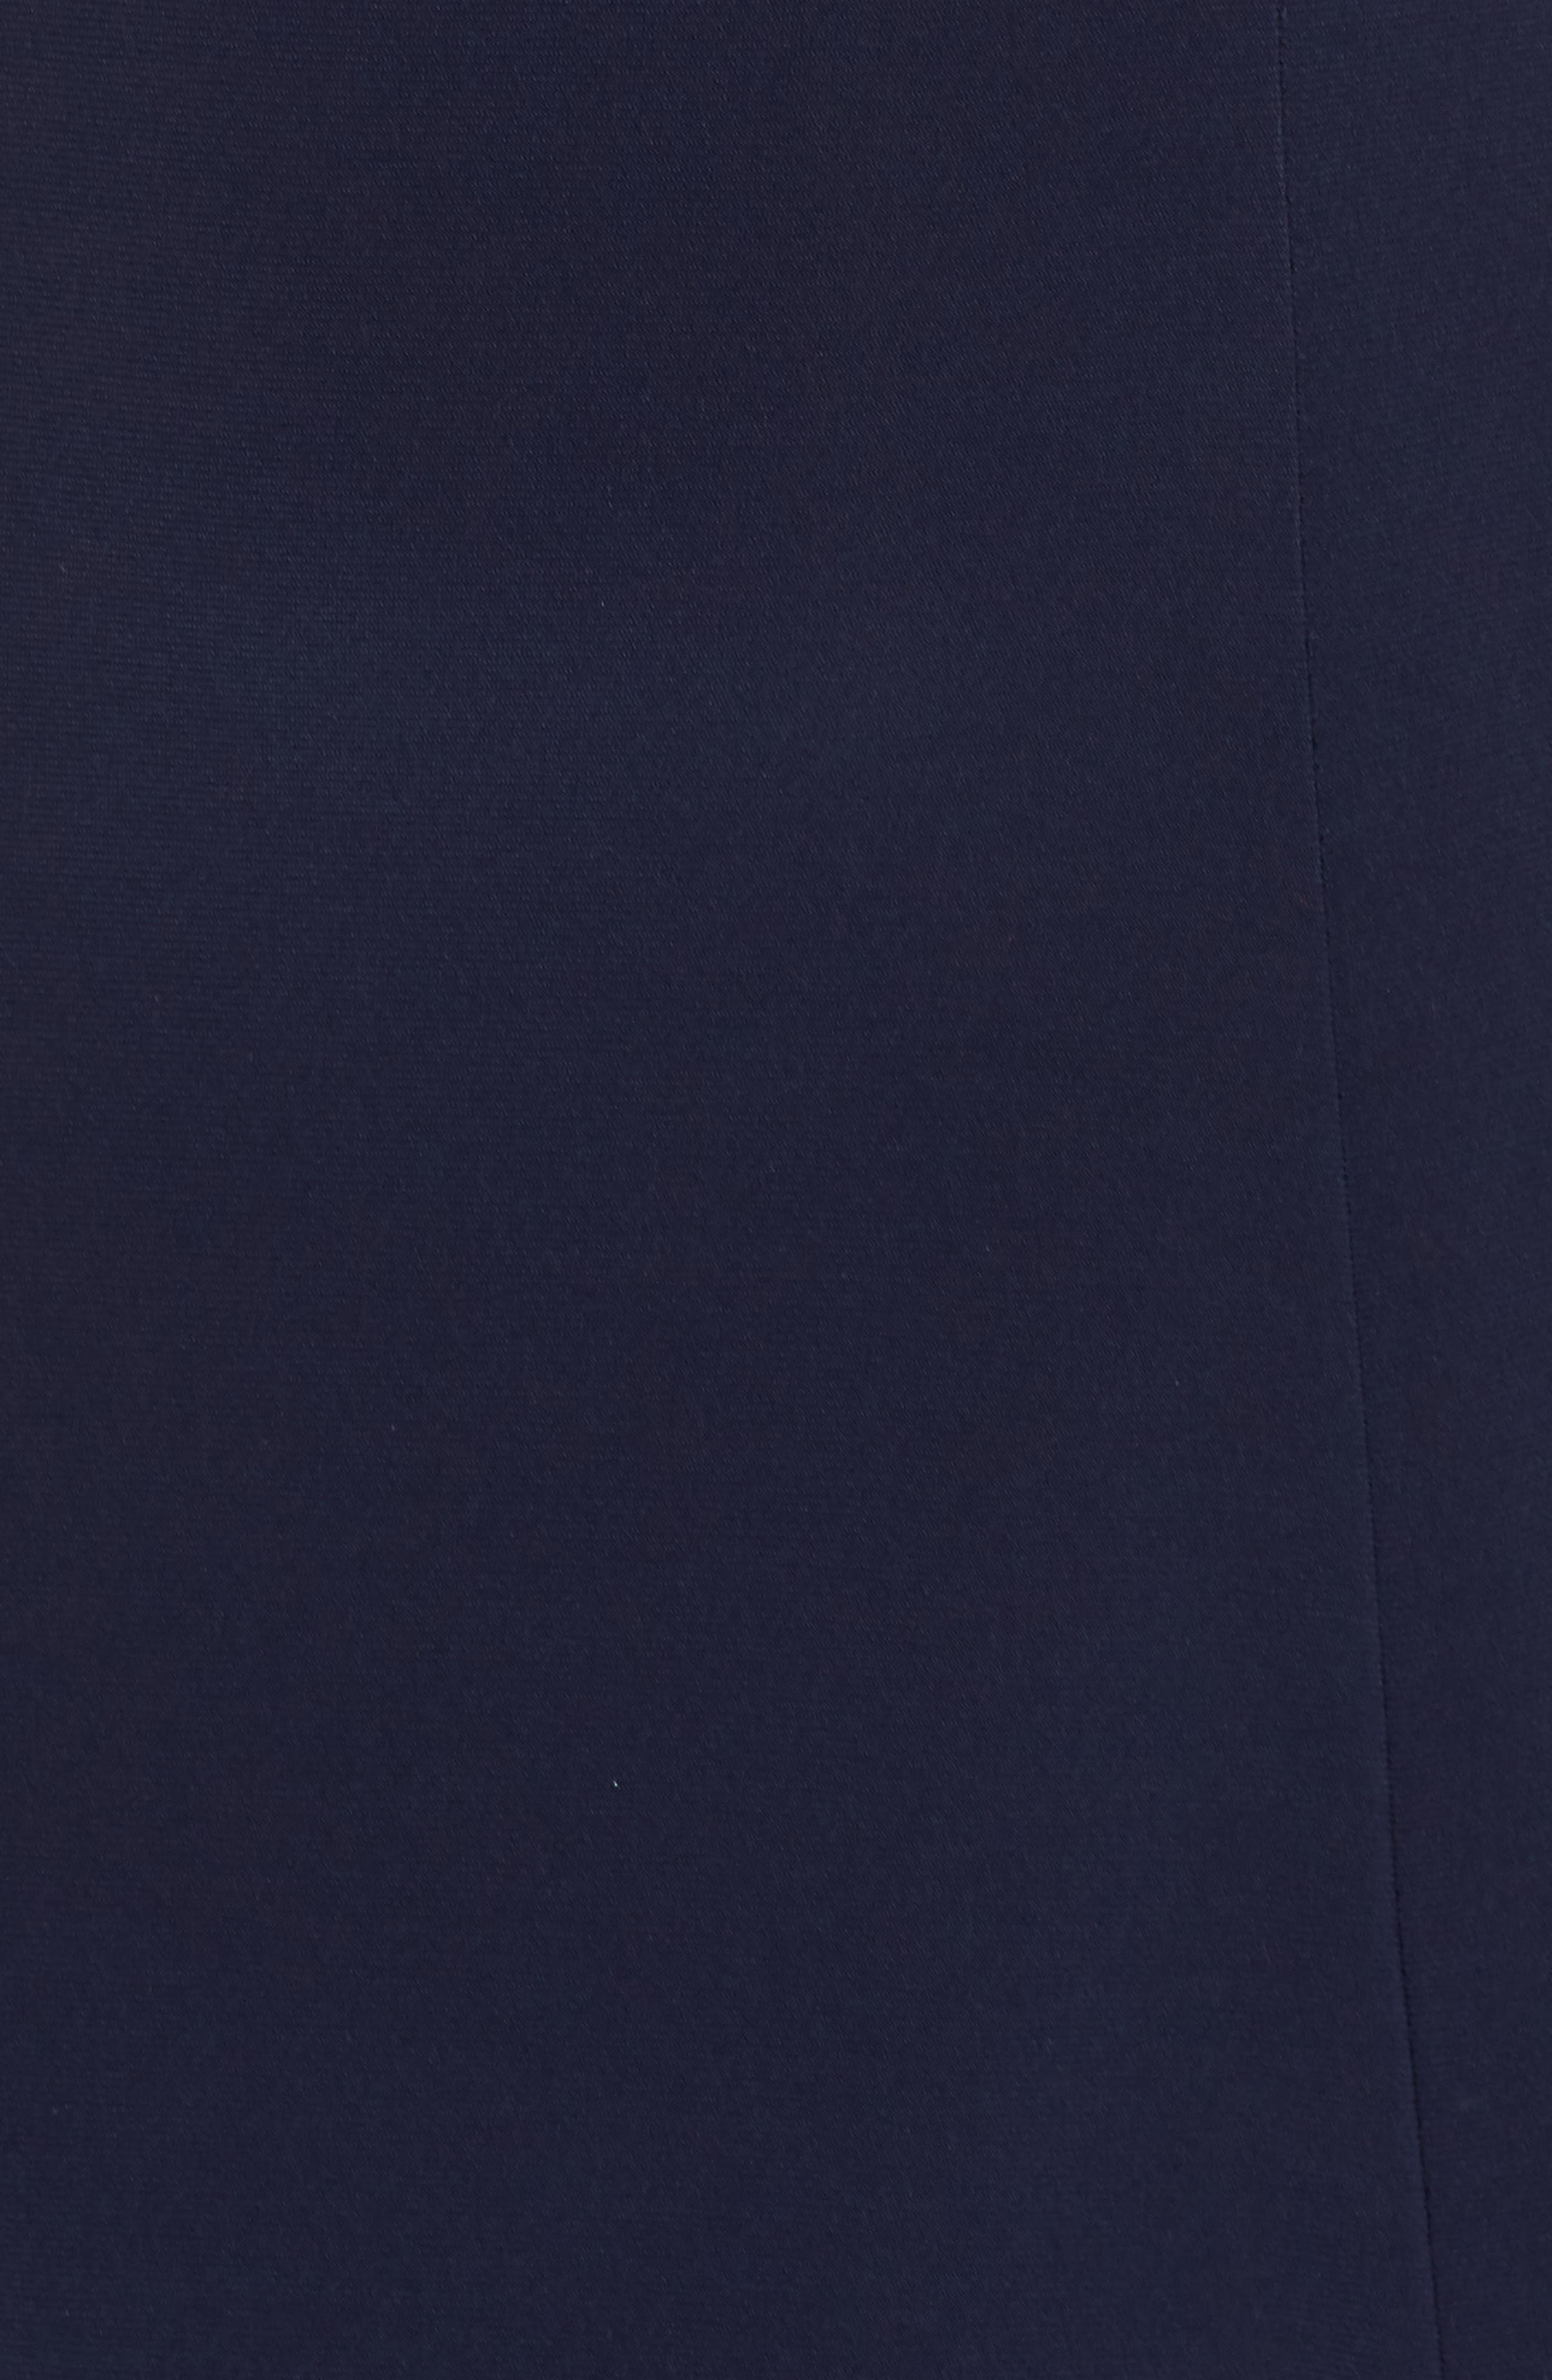 Deep V-Neck Skater Dress,                             Alternate thumbnail 6, color,                             NAVY/ NUDE/ SILVER